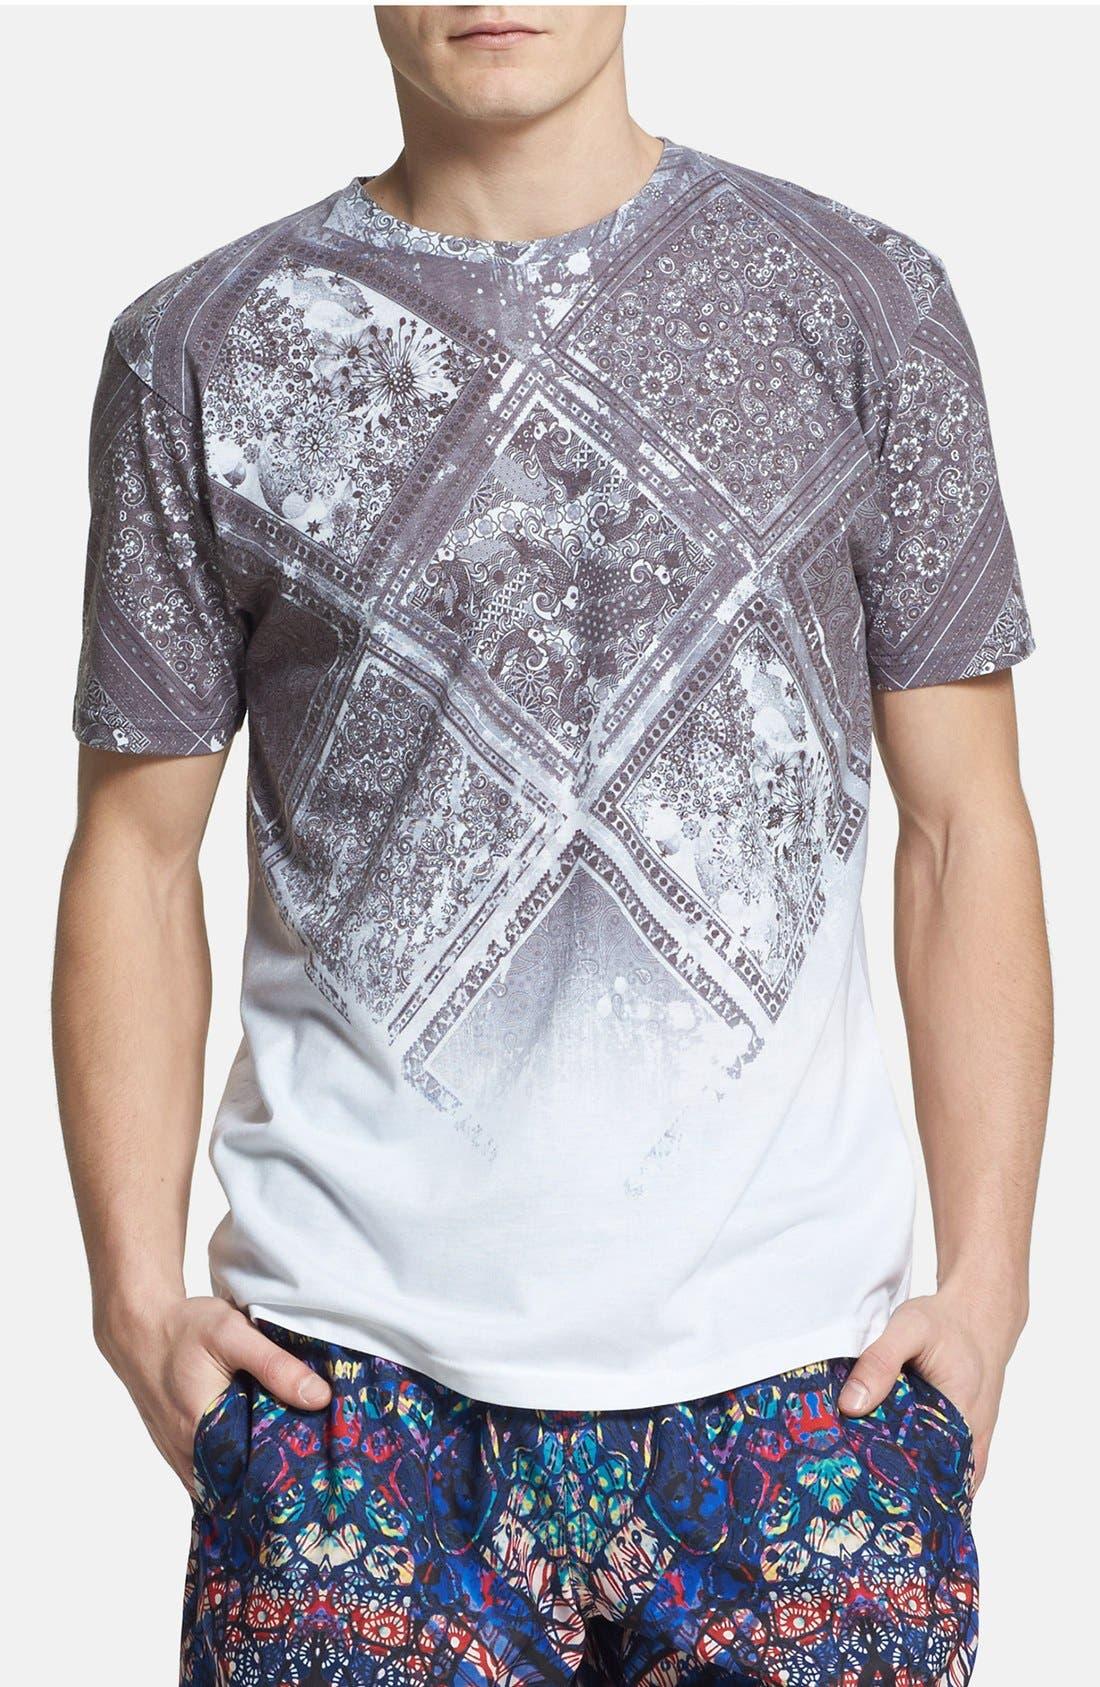 Alternate Image 1 Selected - Topman Paisley Tile Print T-Shirt